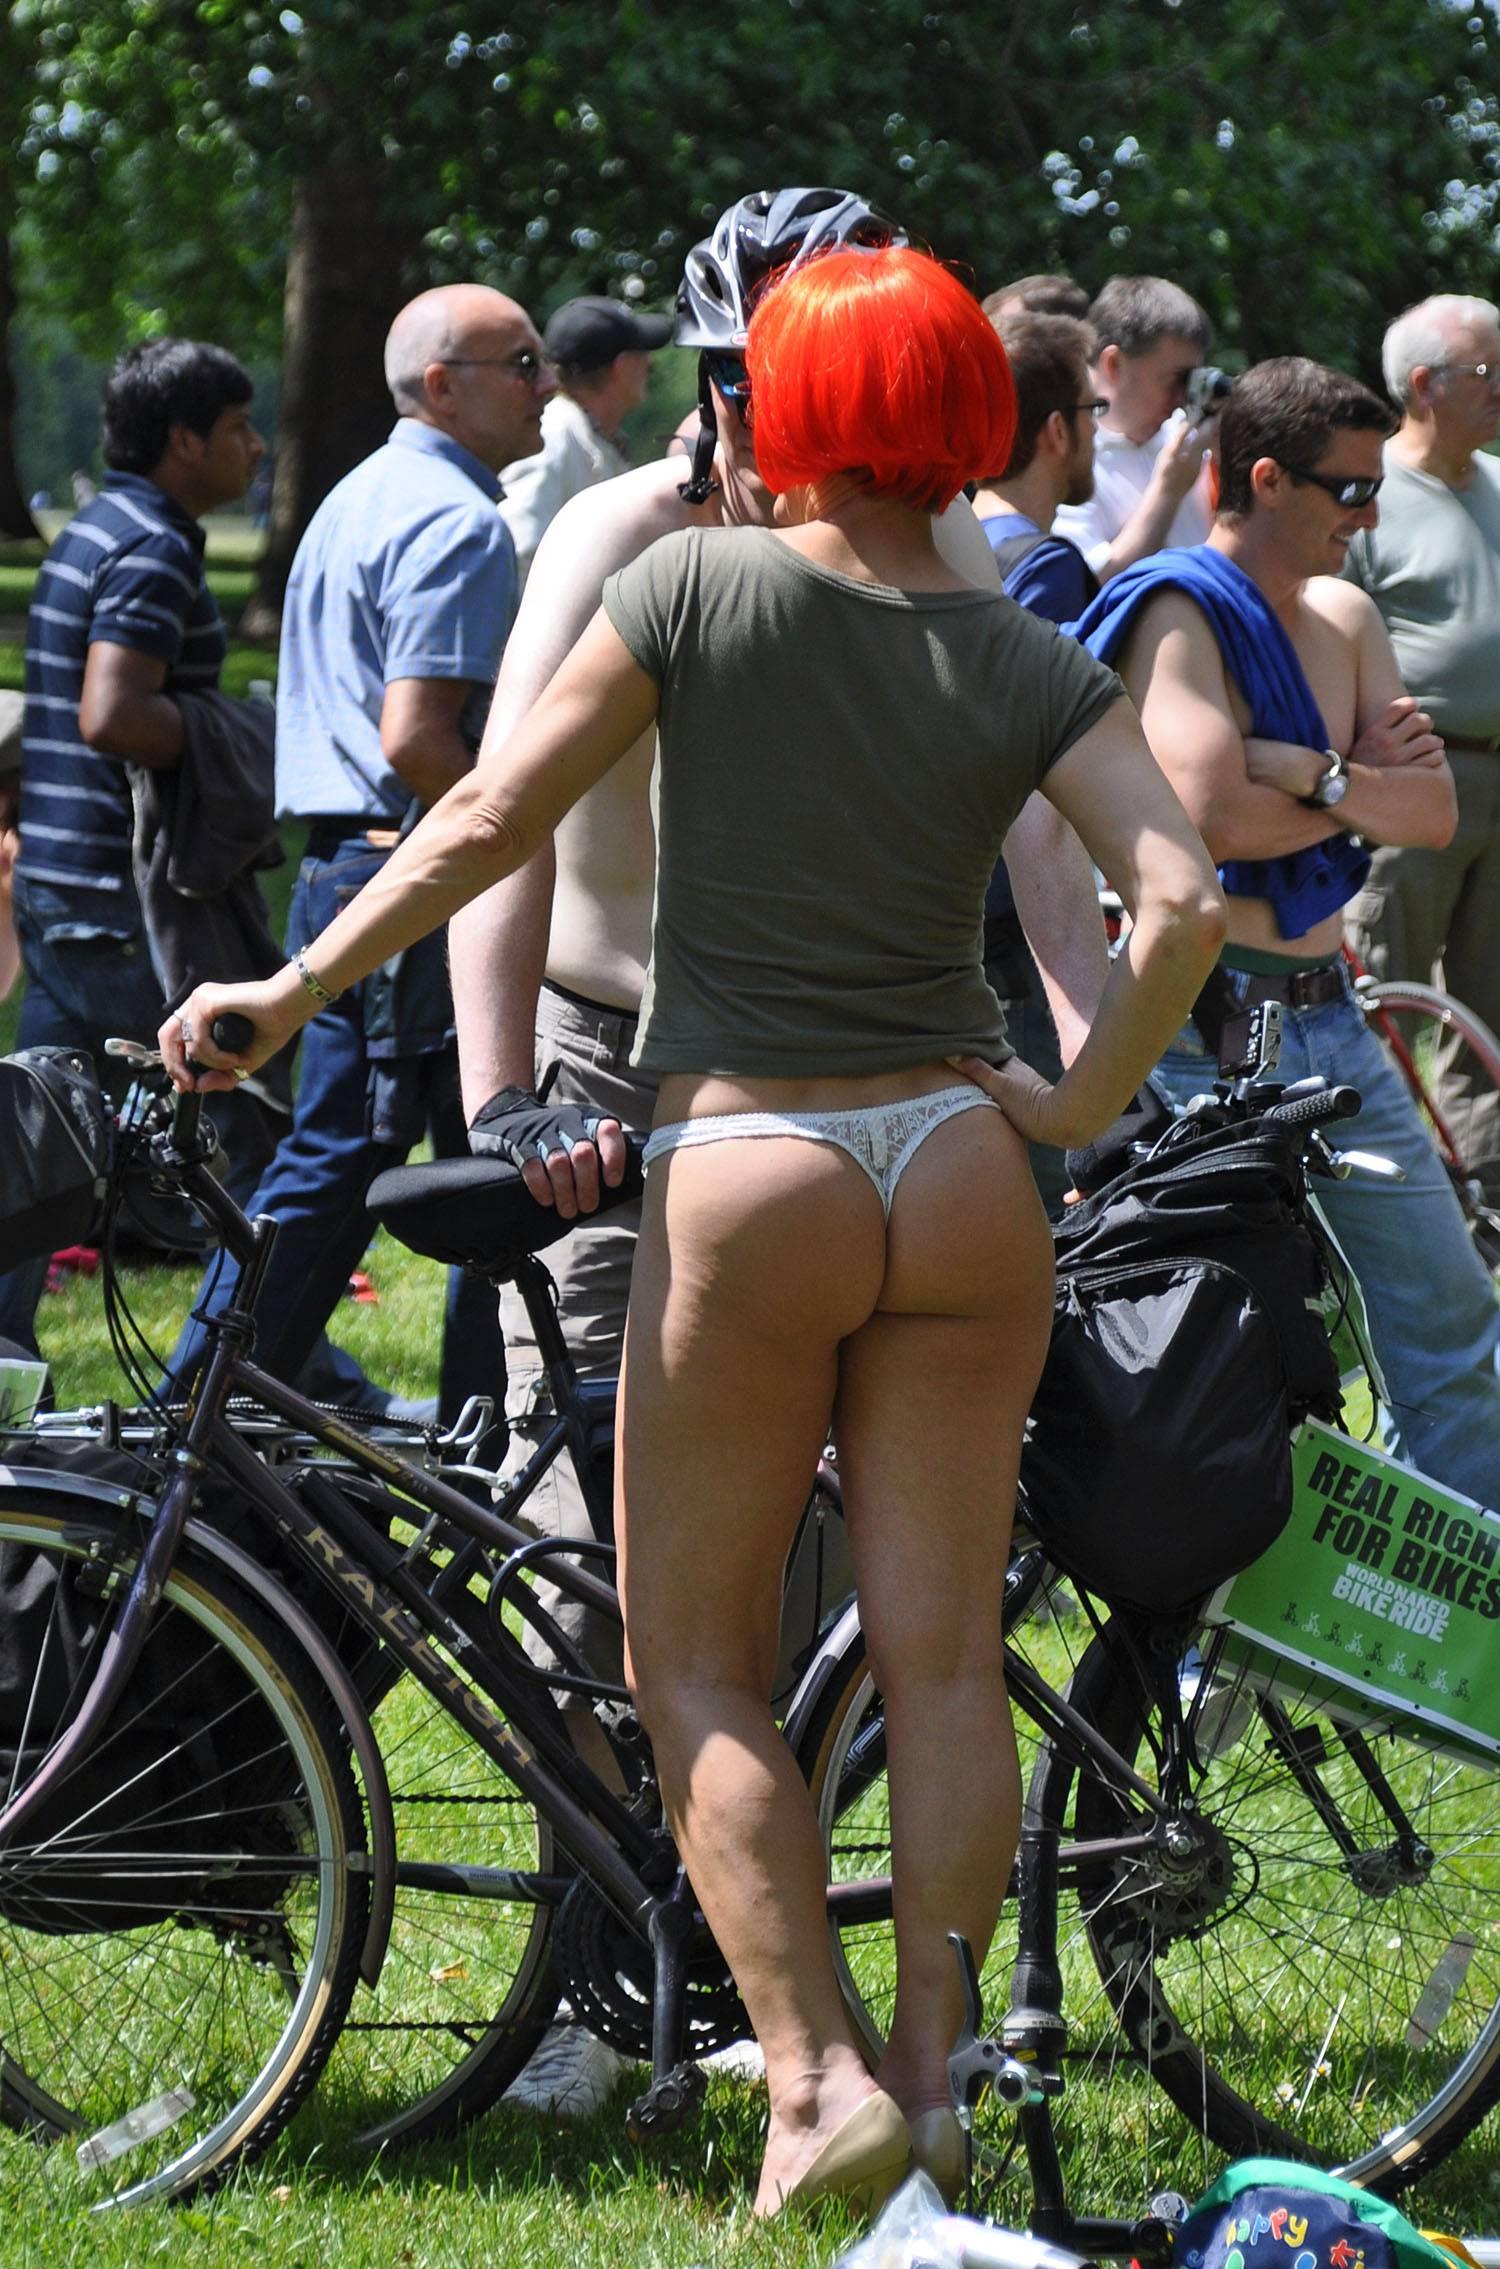 Nudist Pictures World Naked Bike Ride (WNBR) 2009 - 1